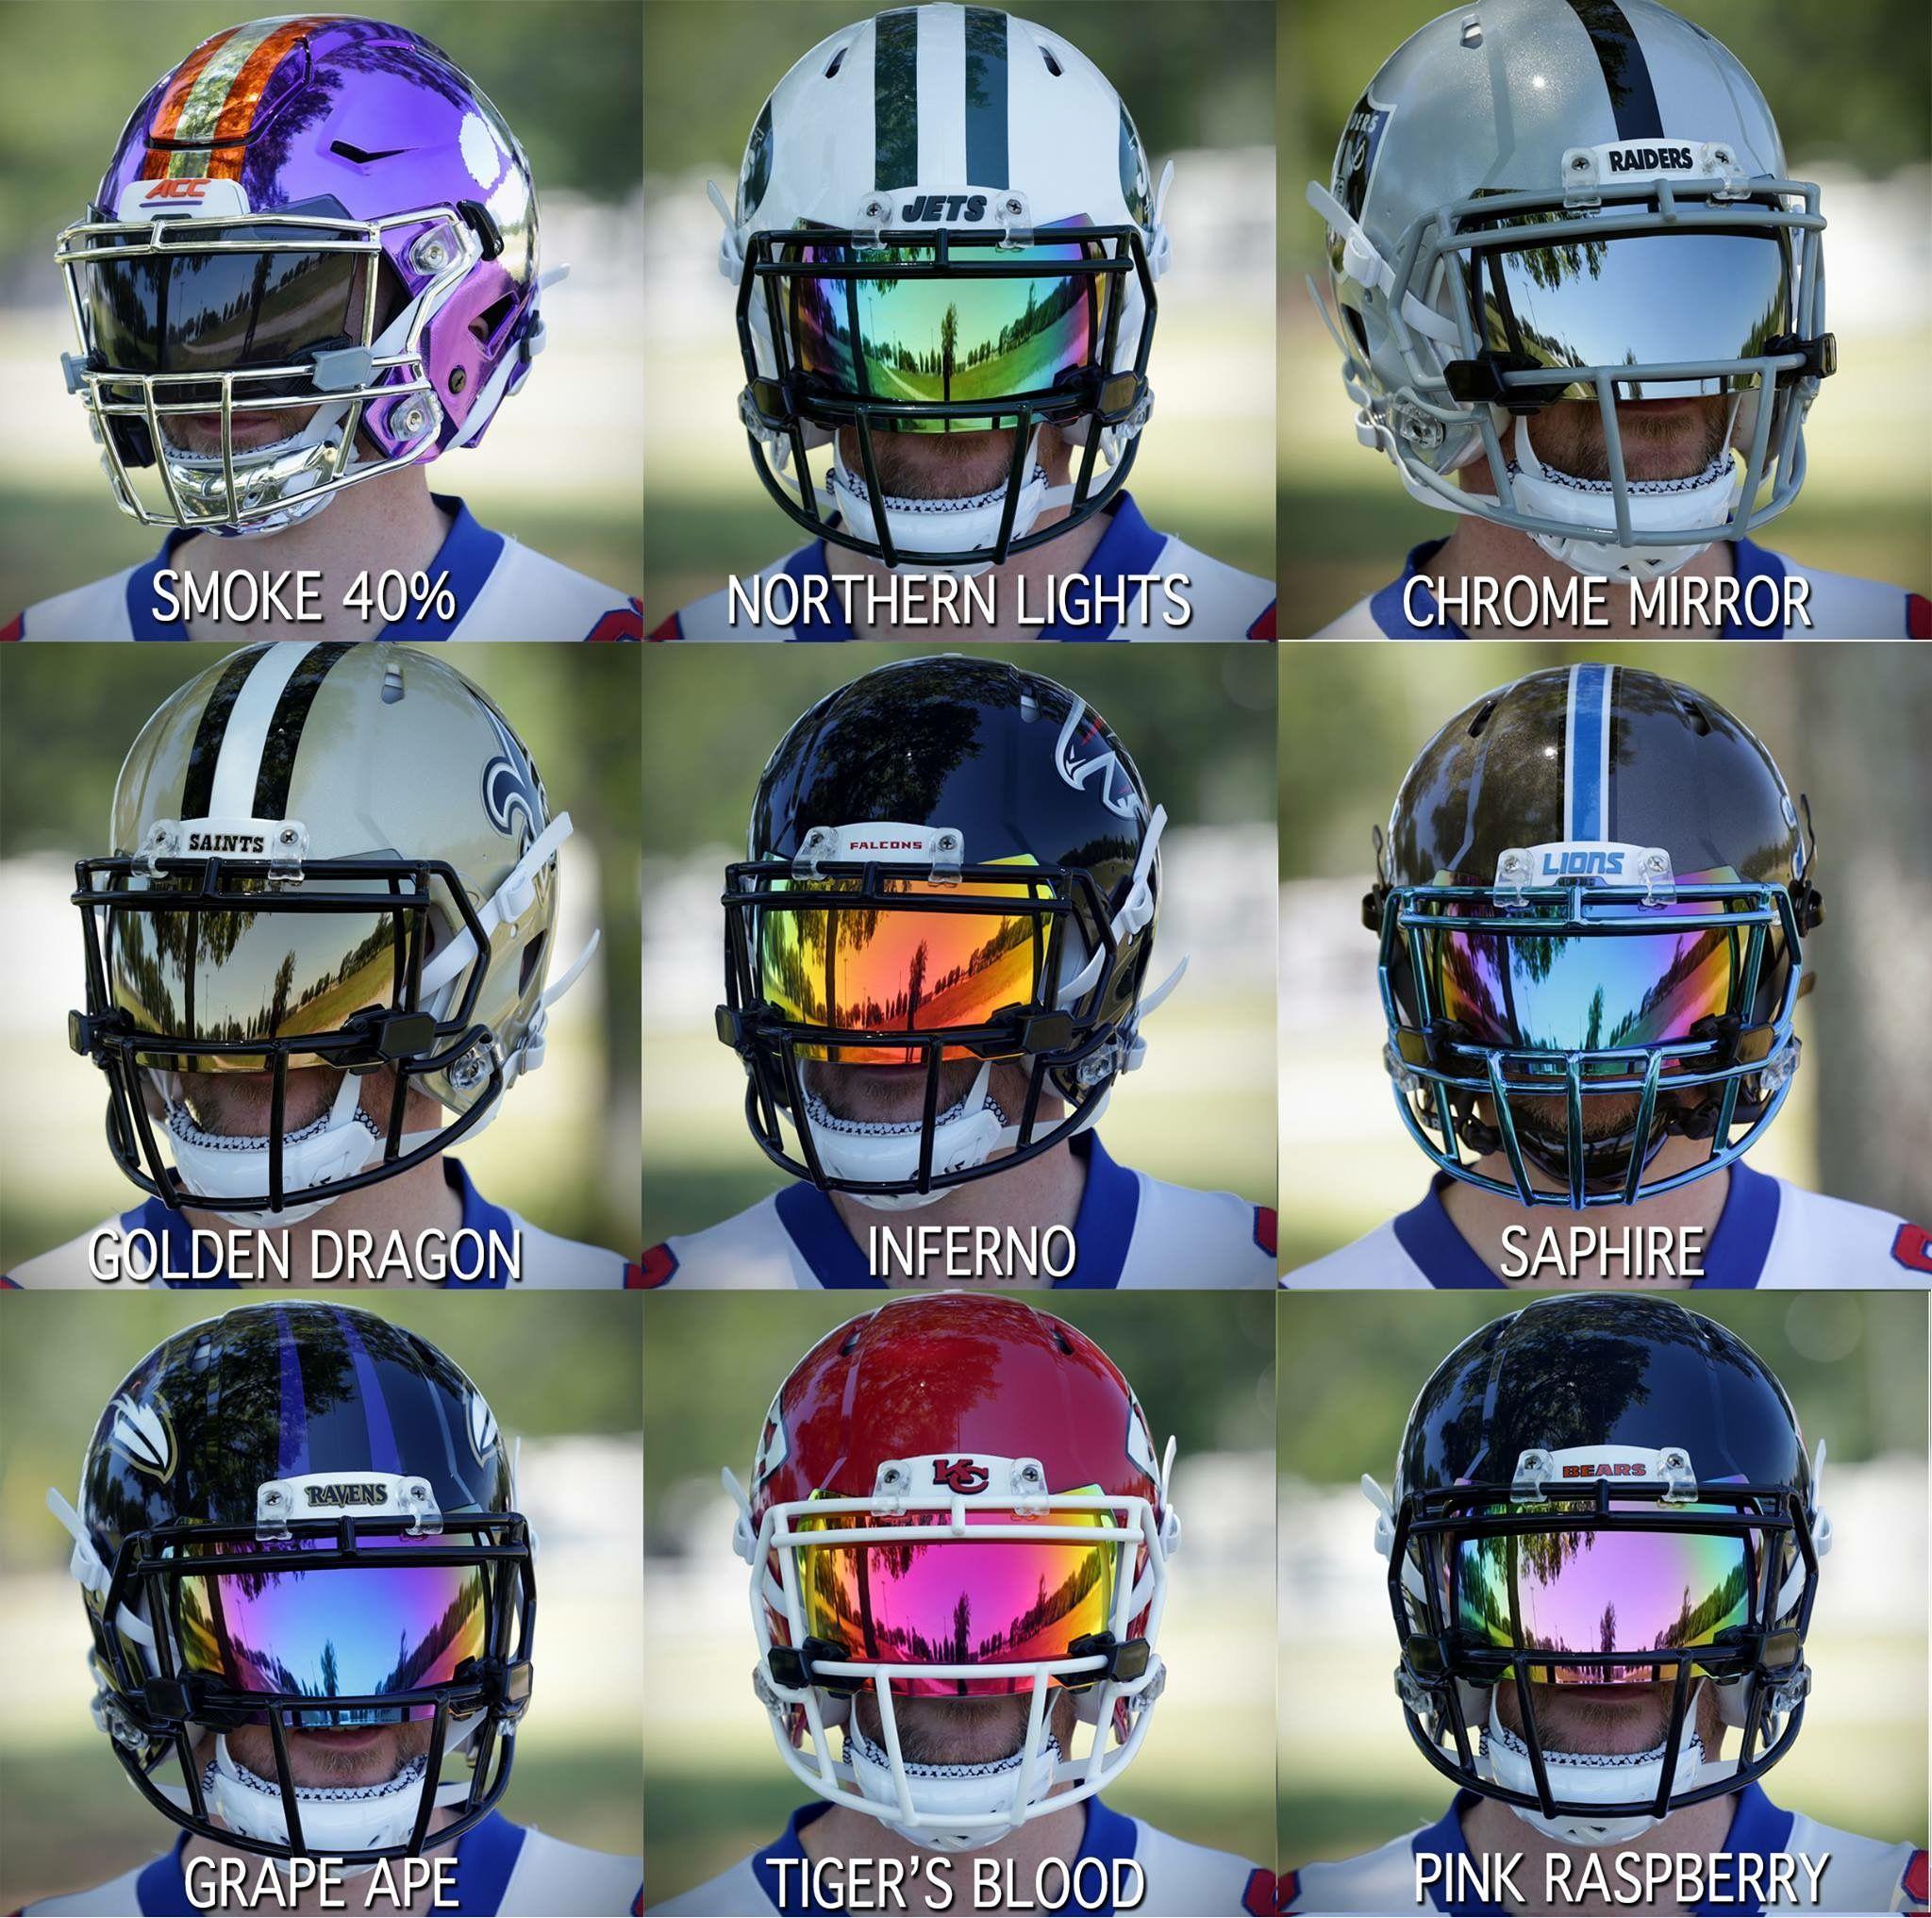 Shoc 20 lightning football visors will fit the most